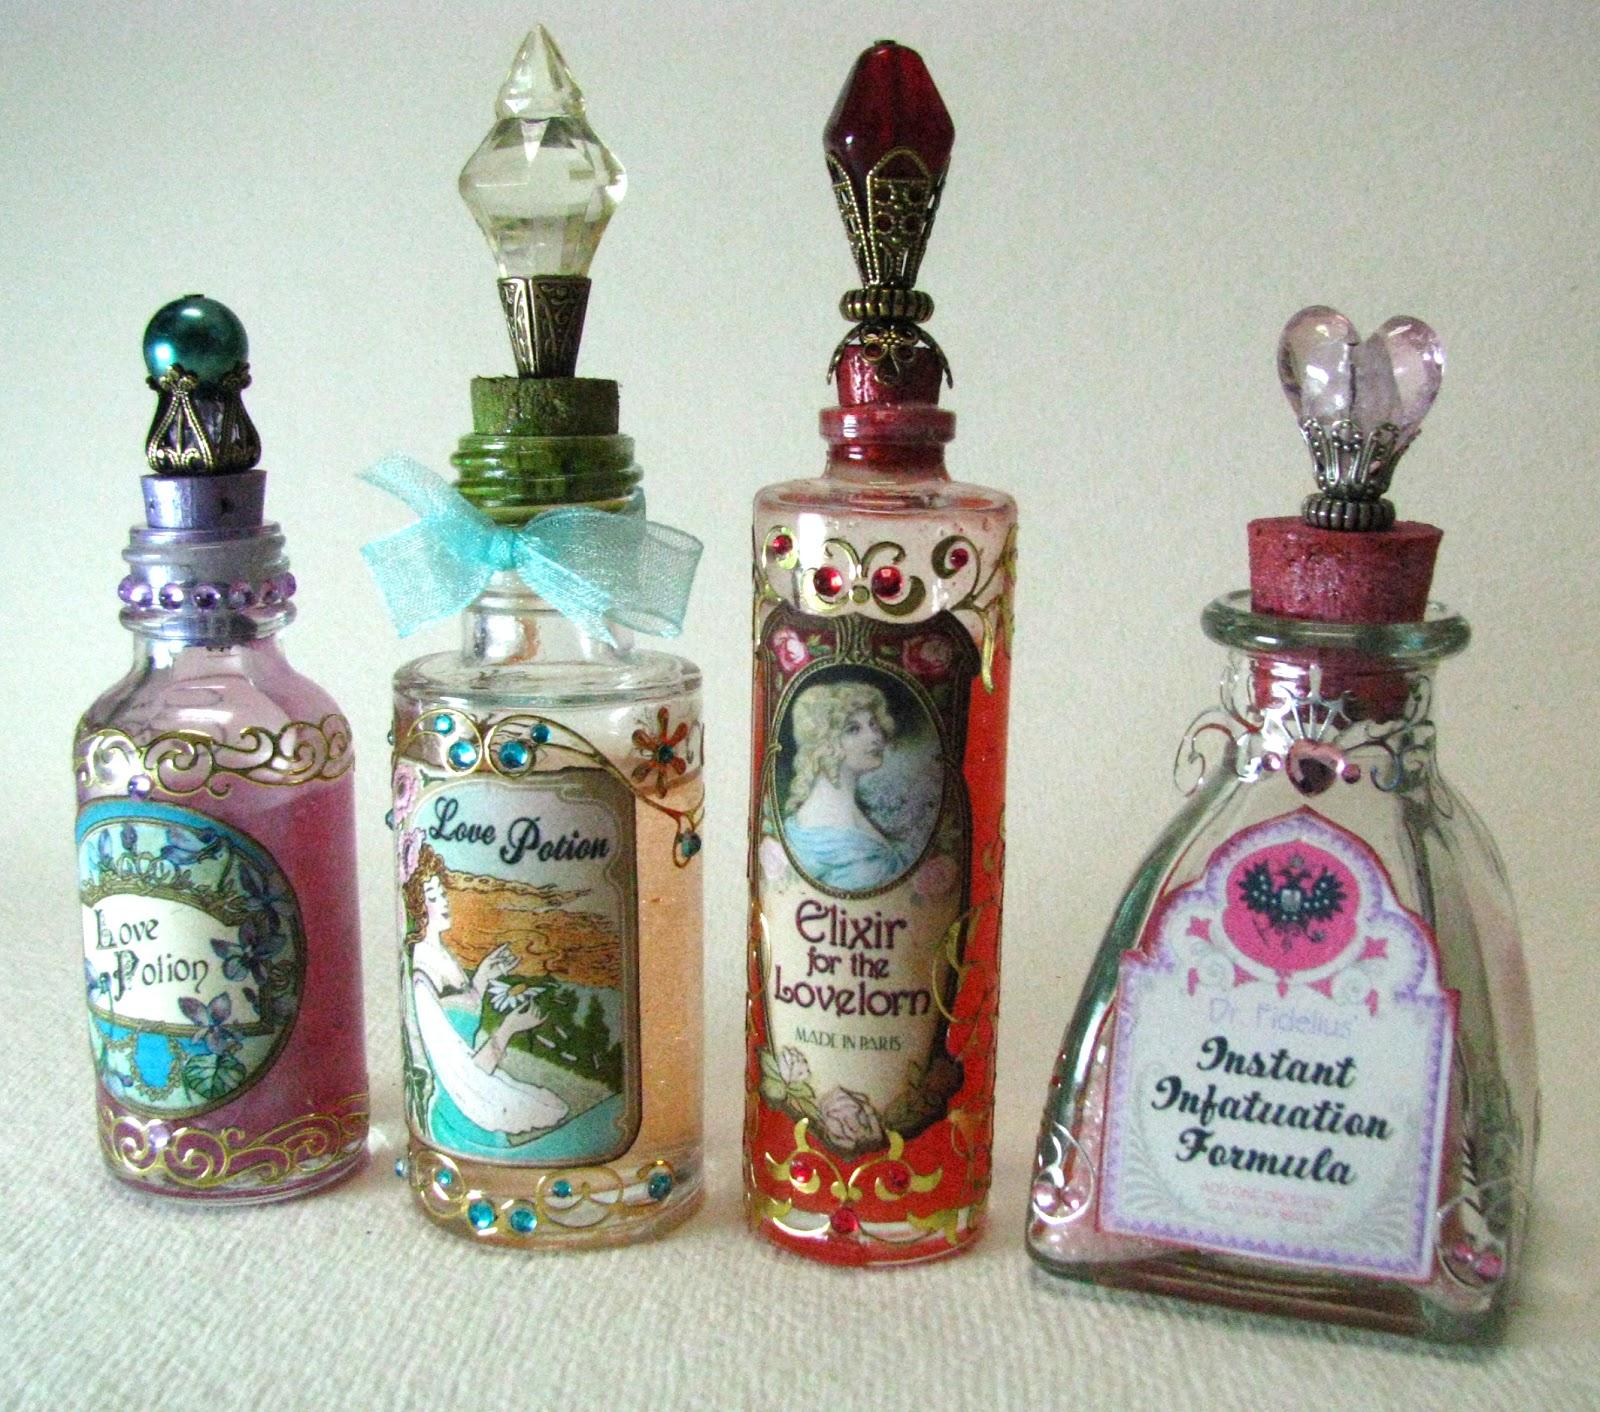 dekupaj-sise-dekoratif-vintage